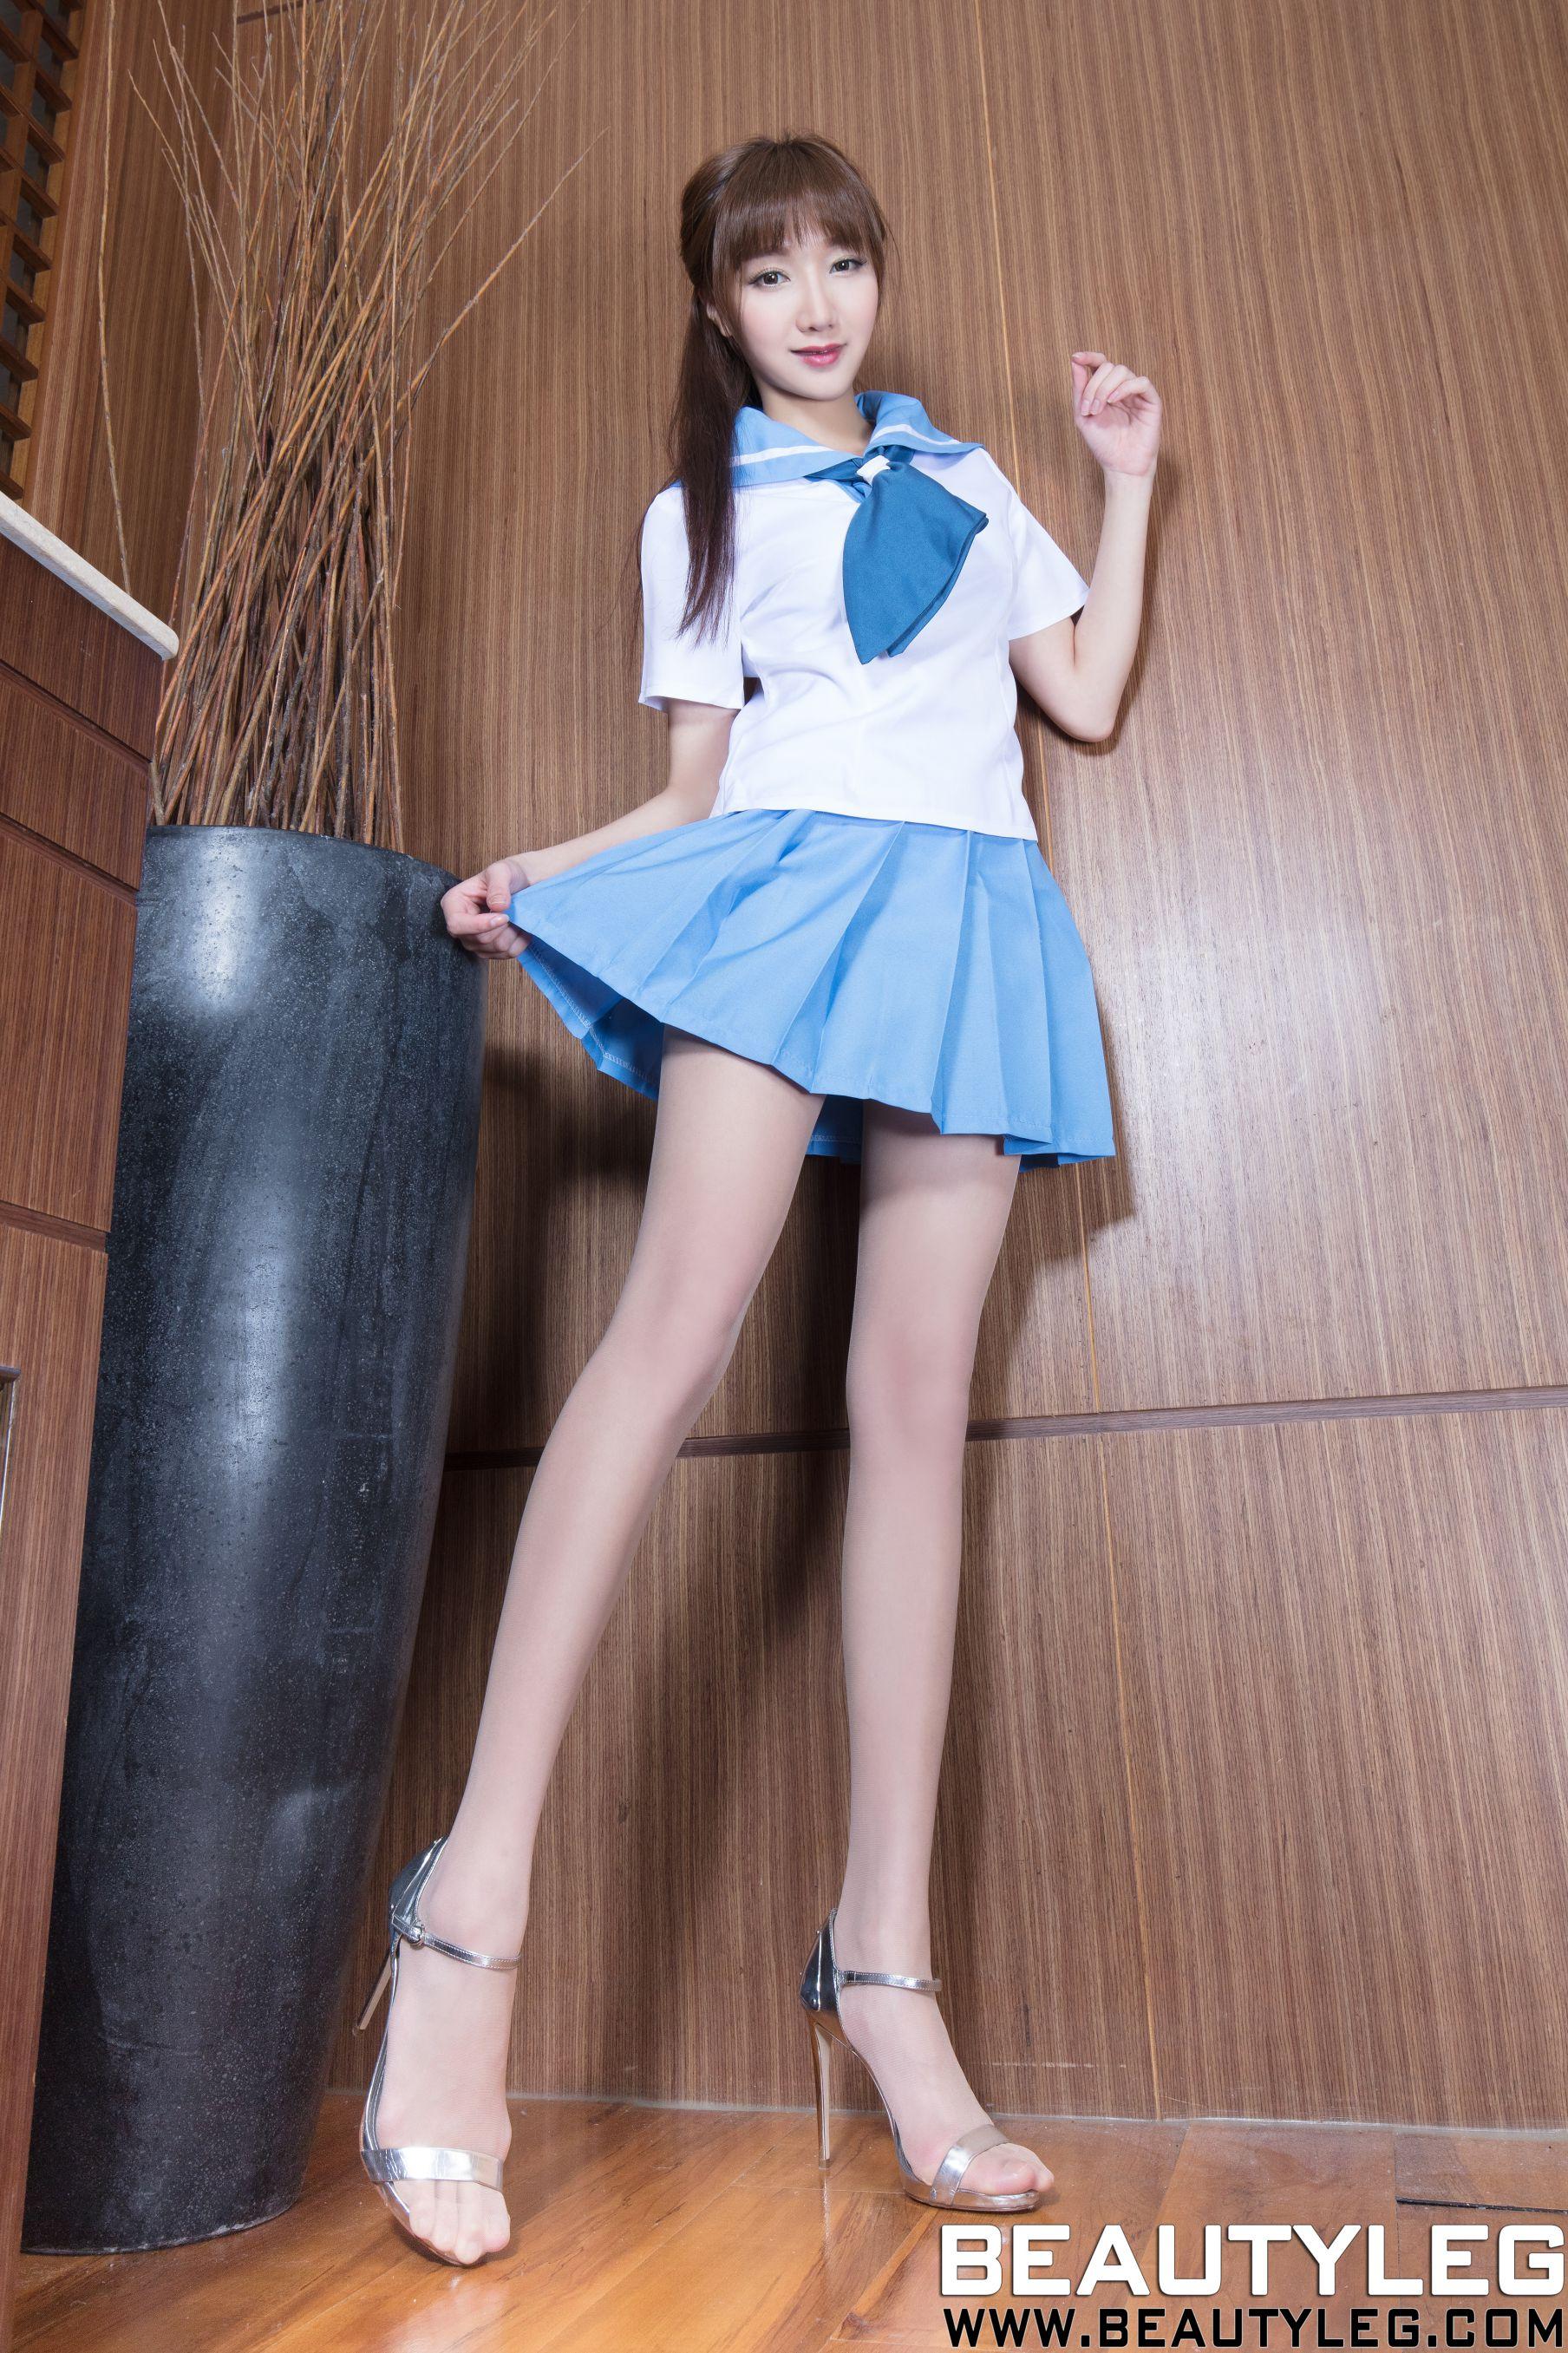 VOL.440 [Beautyleg]水手服高跟美腿学生装:陈思婷(腿模Tina,李霜)高品质写真套图(38P)